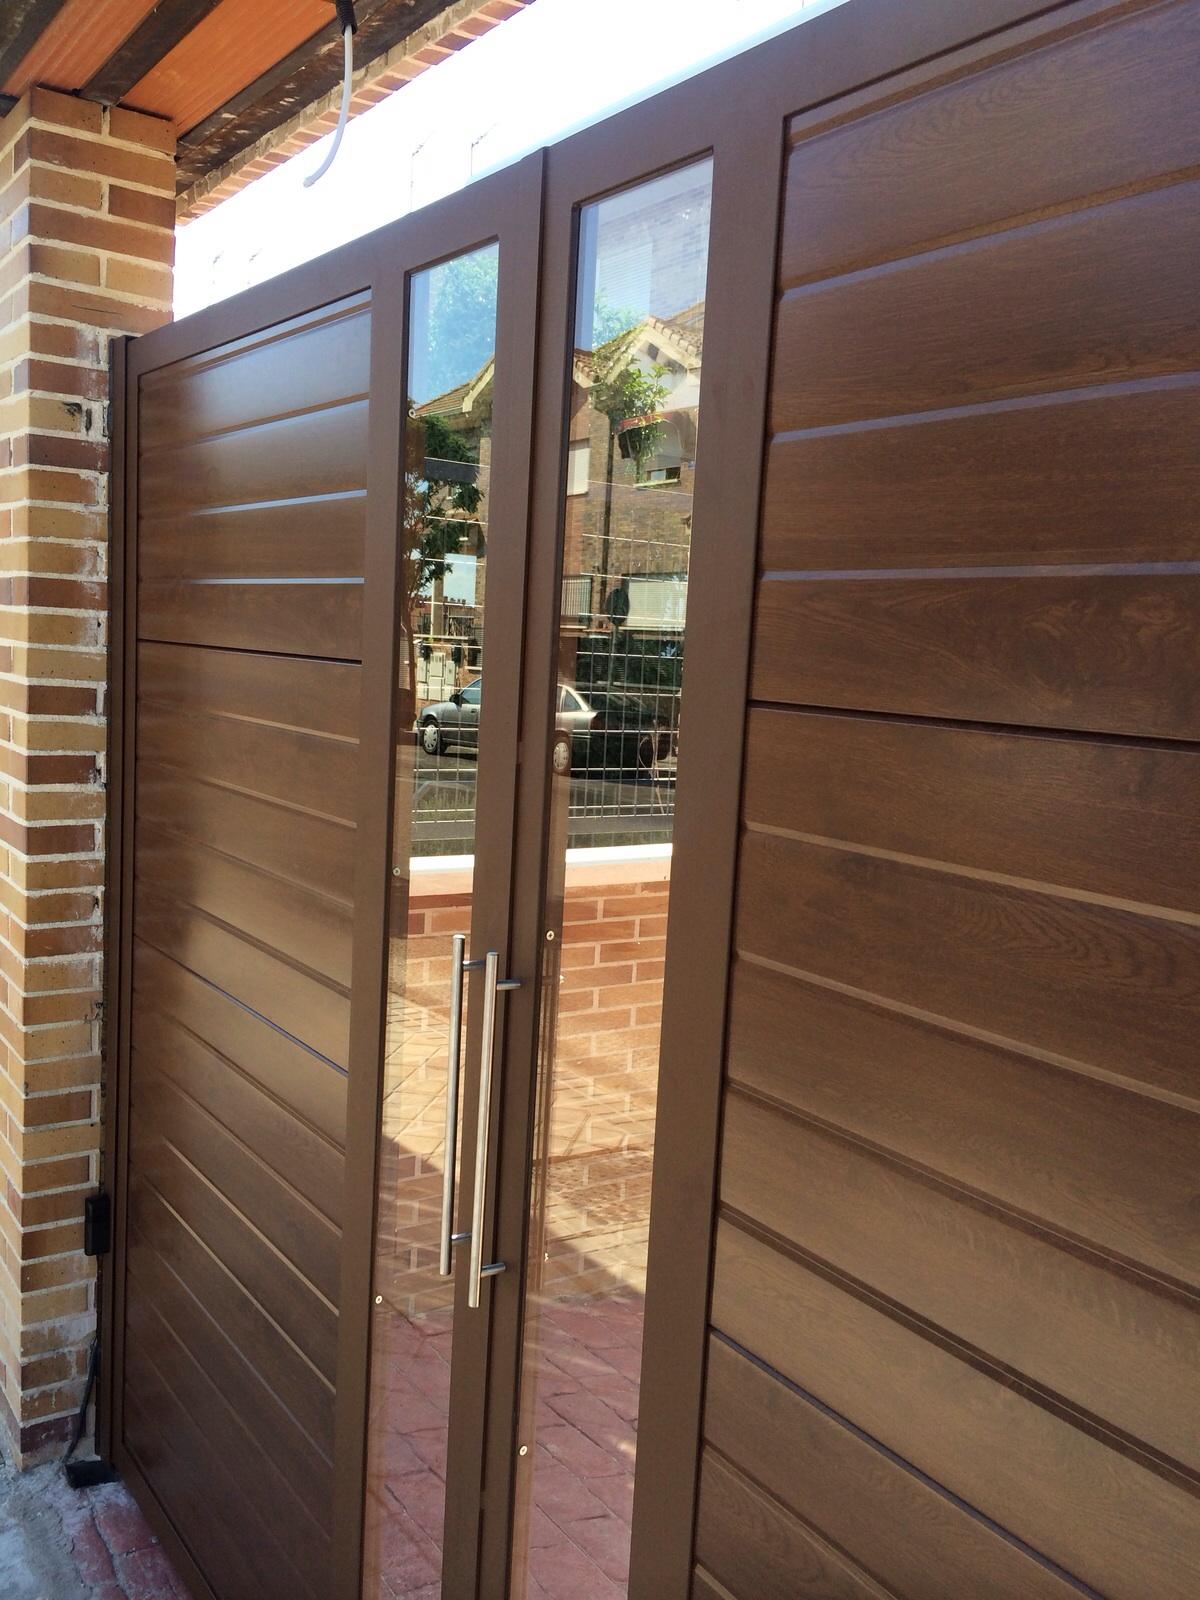 Puertas de panel imitaci n madera con inserto de cristal for Paneles de aluminio para puertas